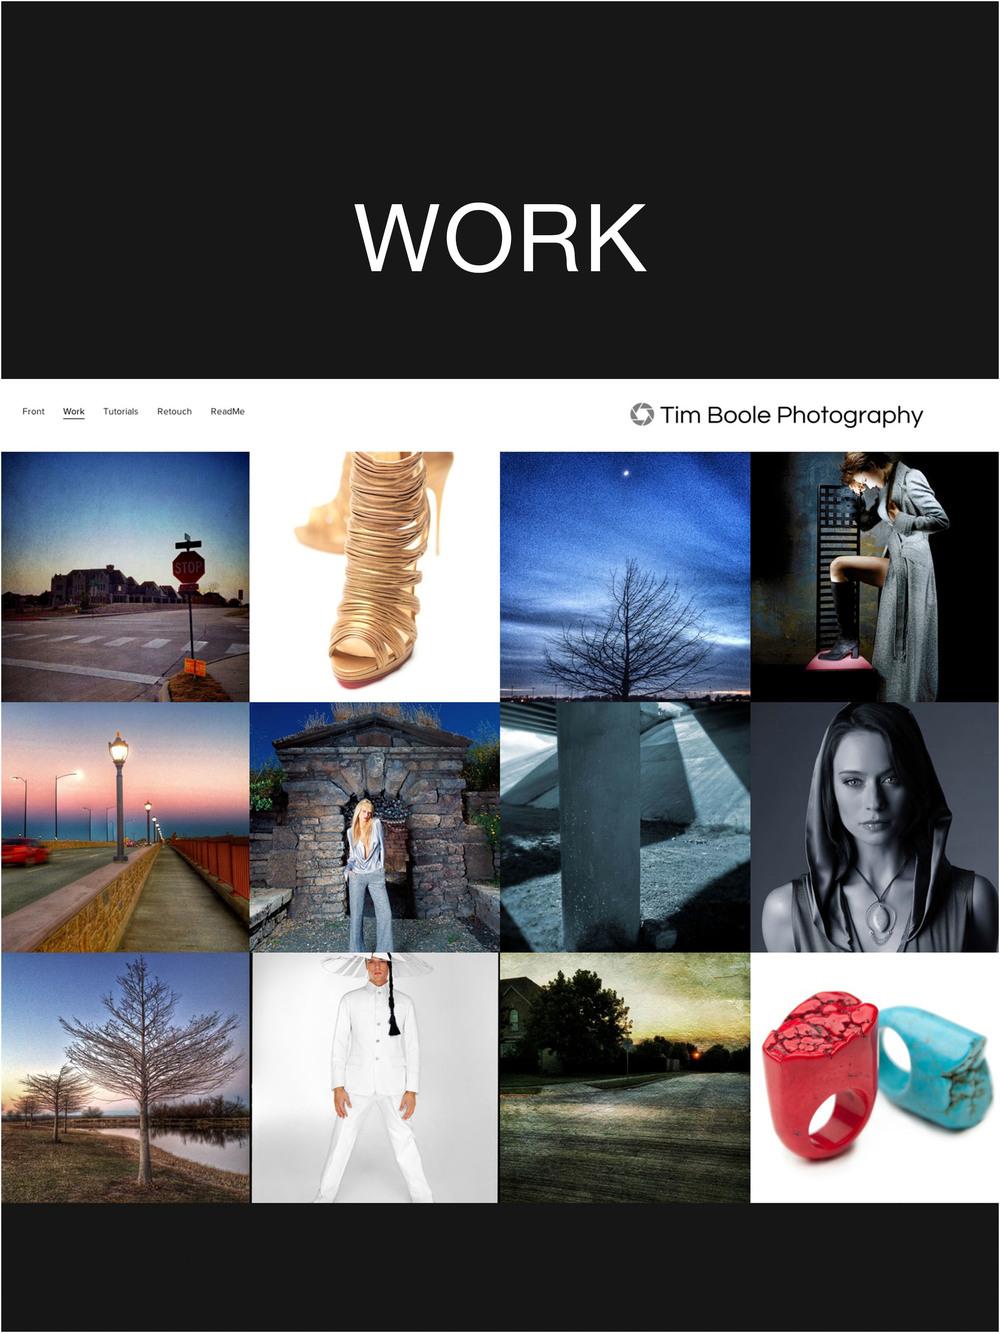 Work Thumb Source 12up.jpg